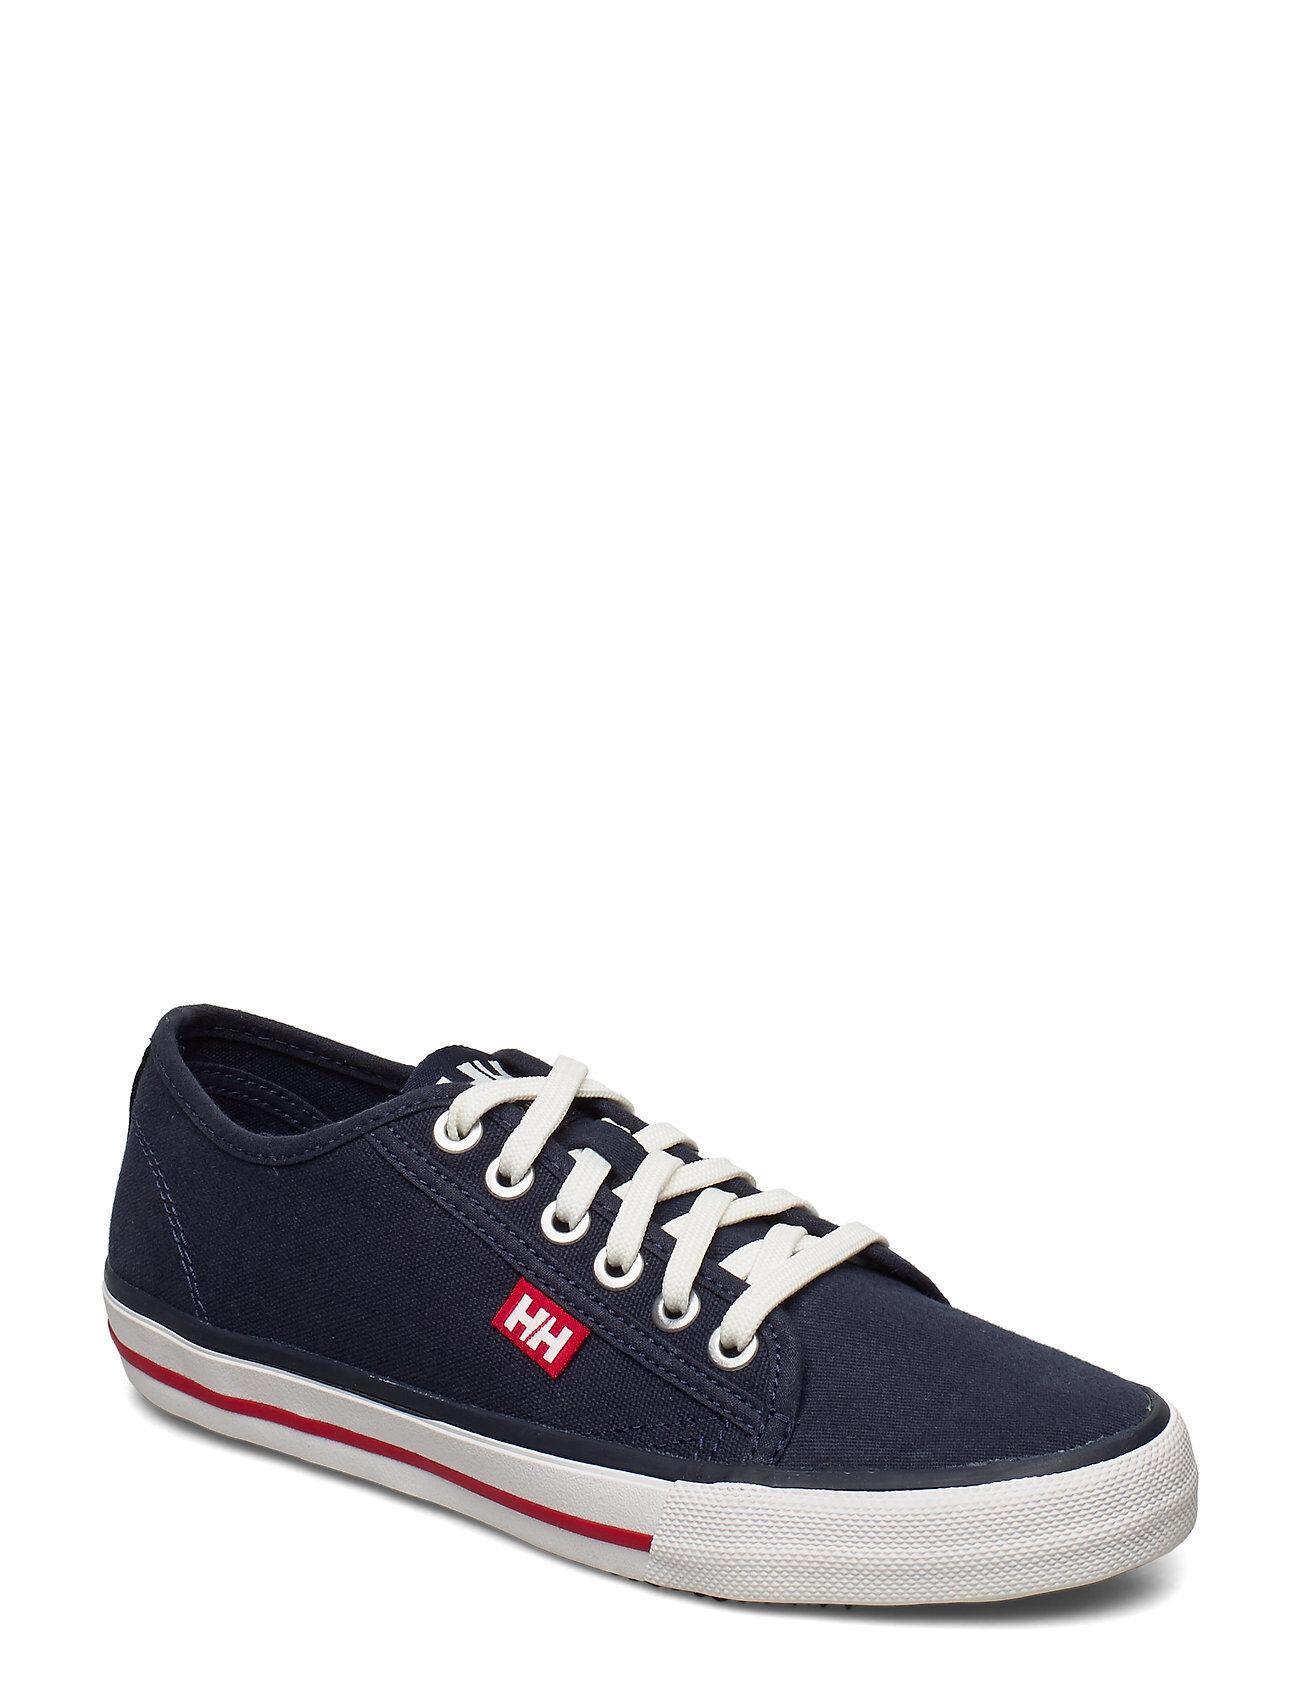 Image of Helly Hansen W Fjord Canvas Shoe V2 Matalavartiset Sneakerit Tennarit Sininen Helly Hansen